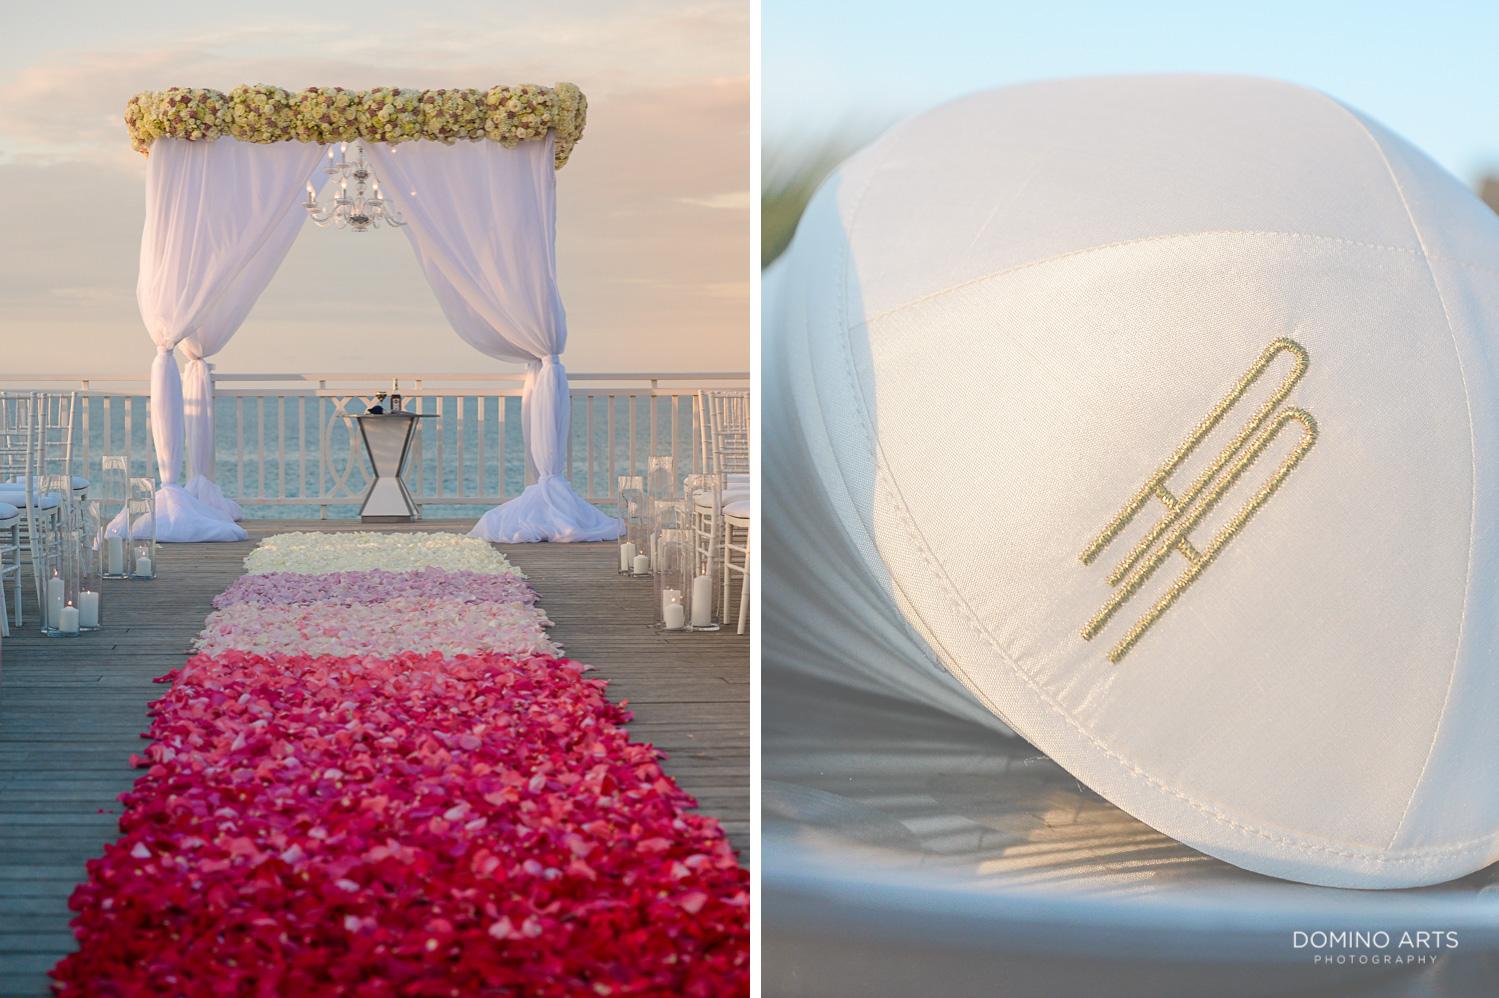 Luxury boutique wedding chuppah décor at One&Only Ocean Club Bahamas